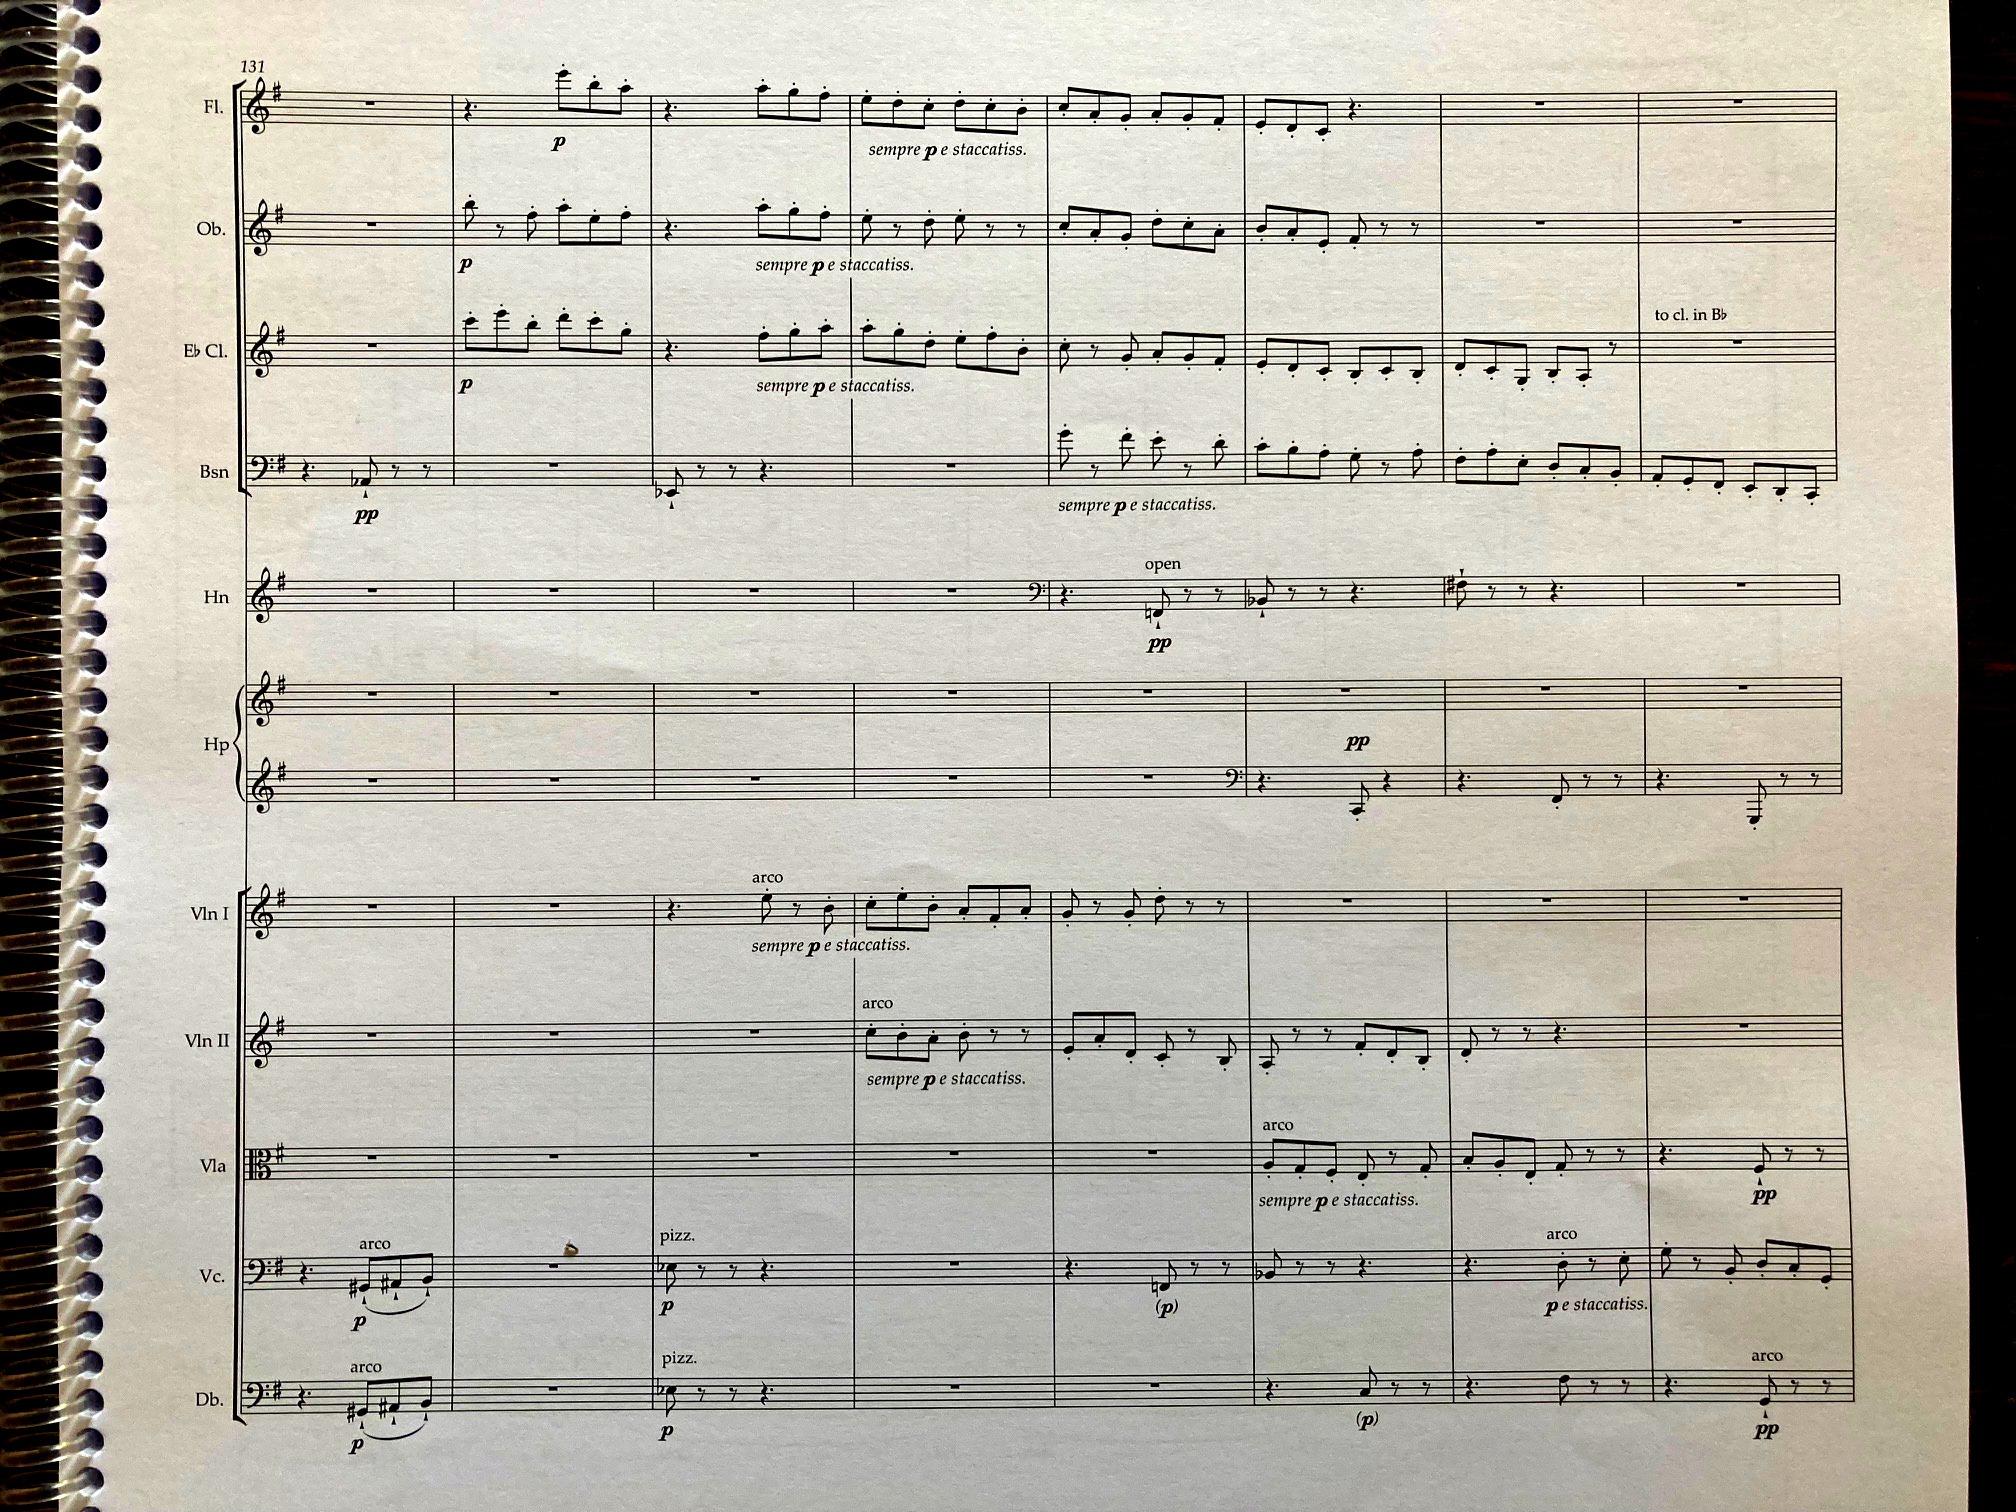 Joseph Phibbs' score for